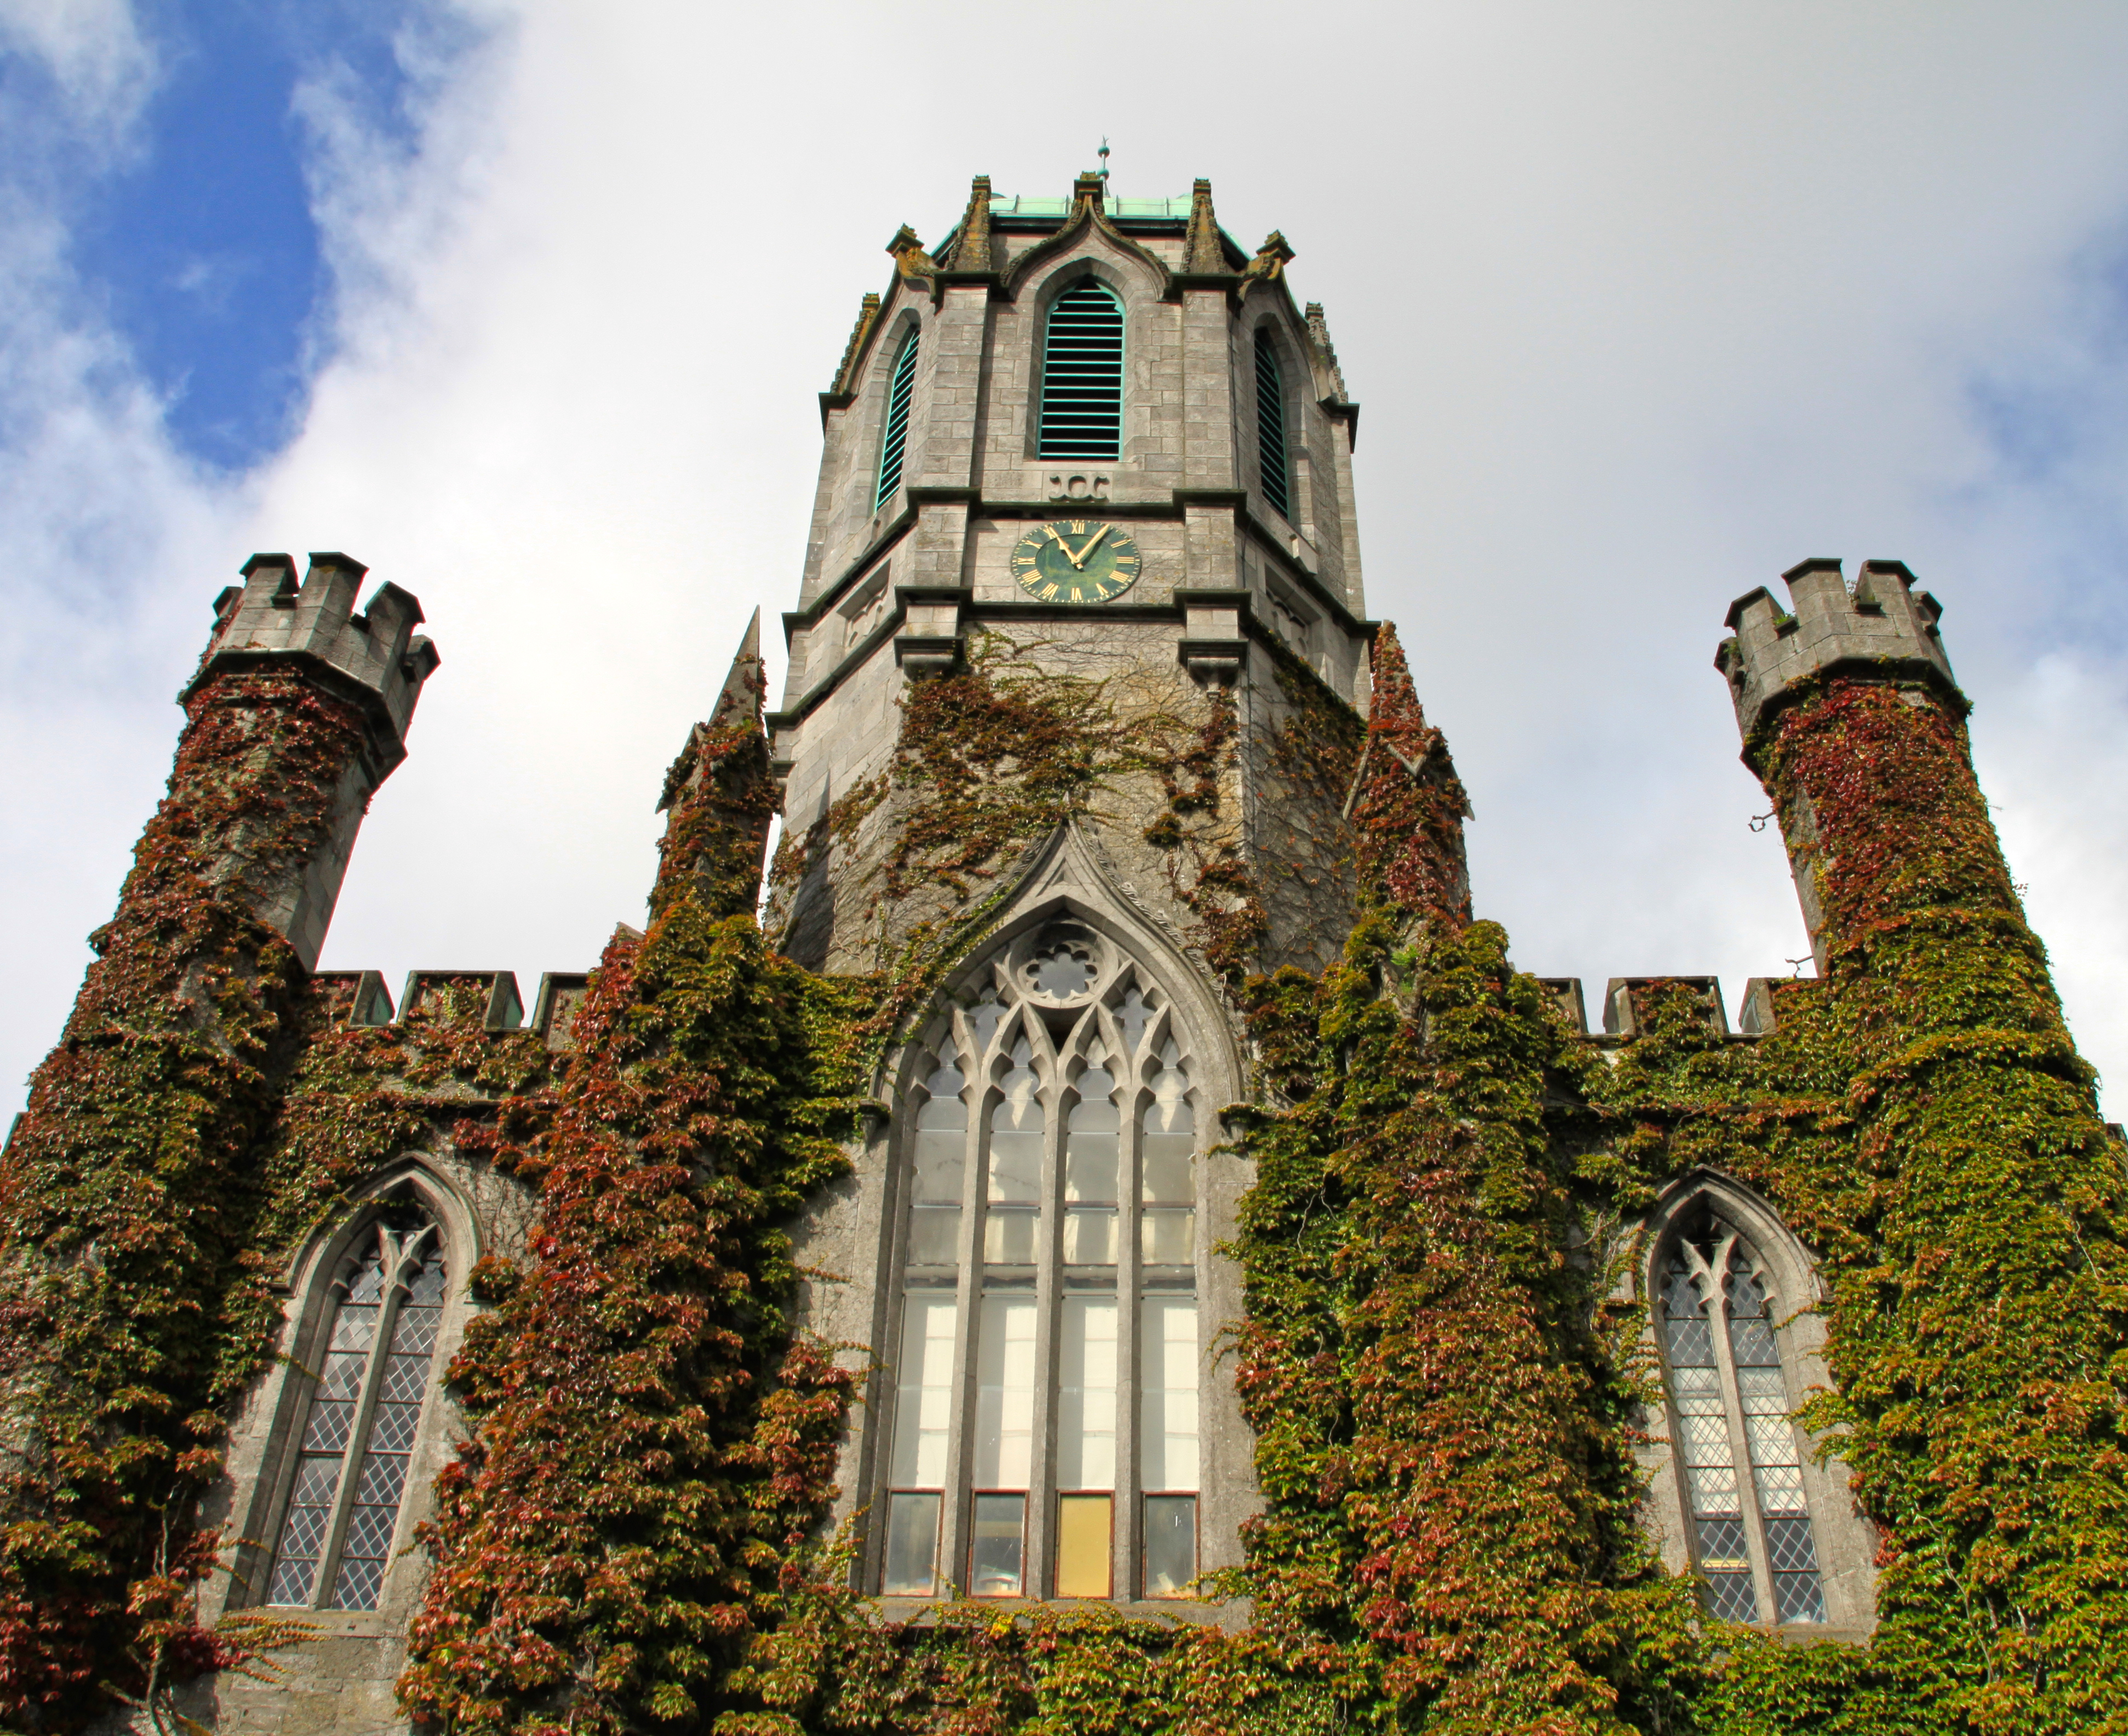 Quadrangle Building, National University of Ireland, Galway